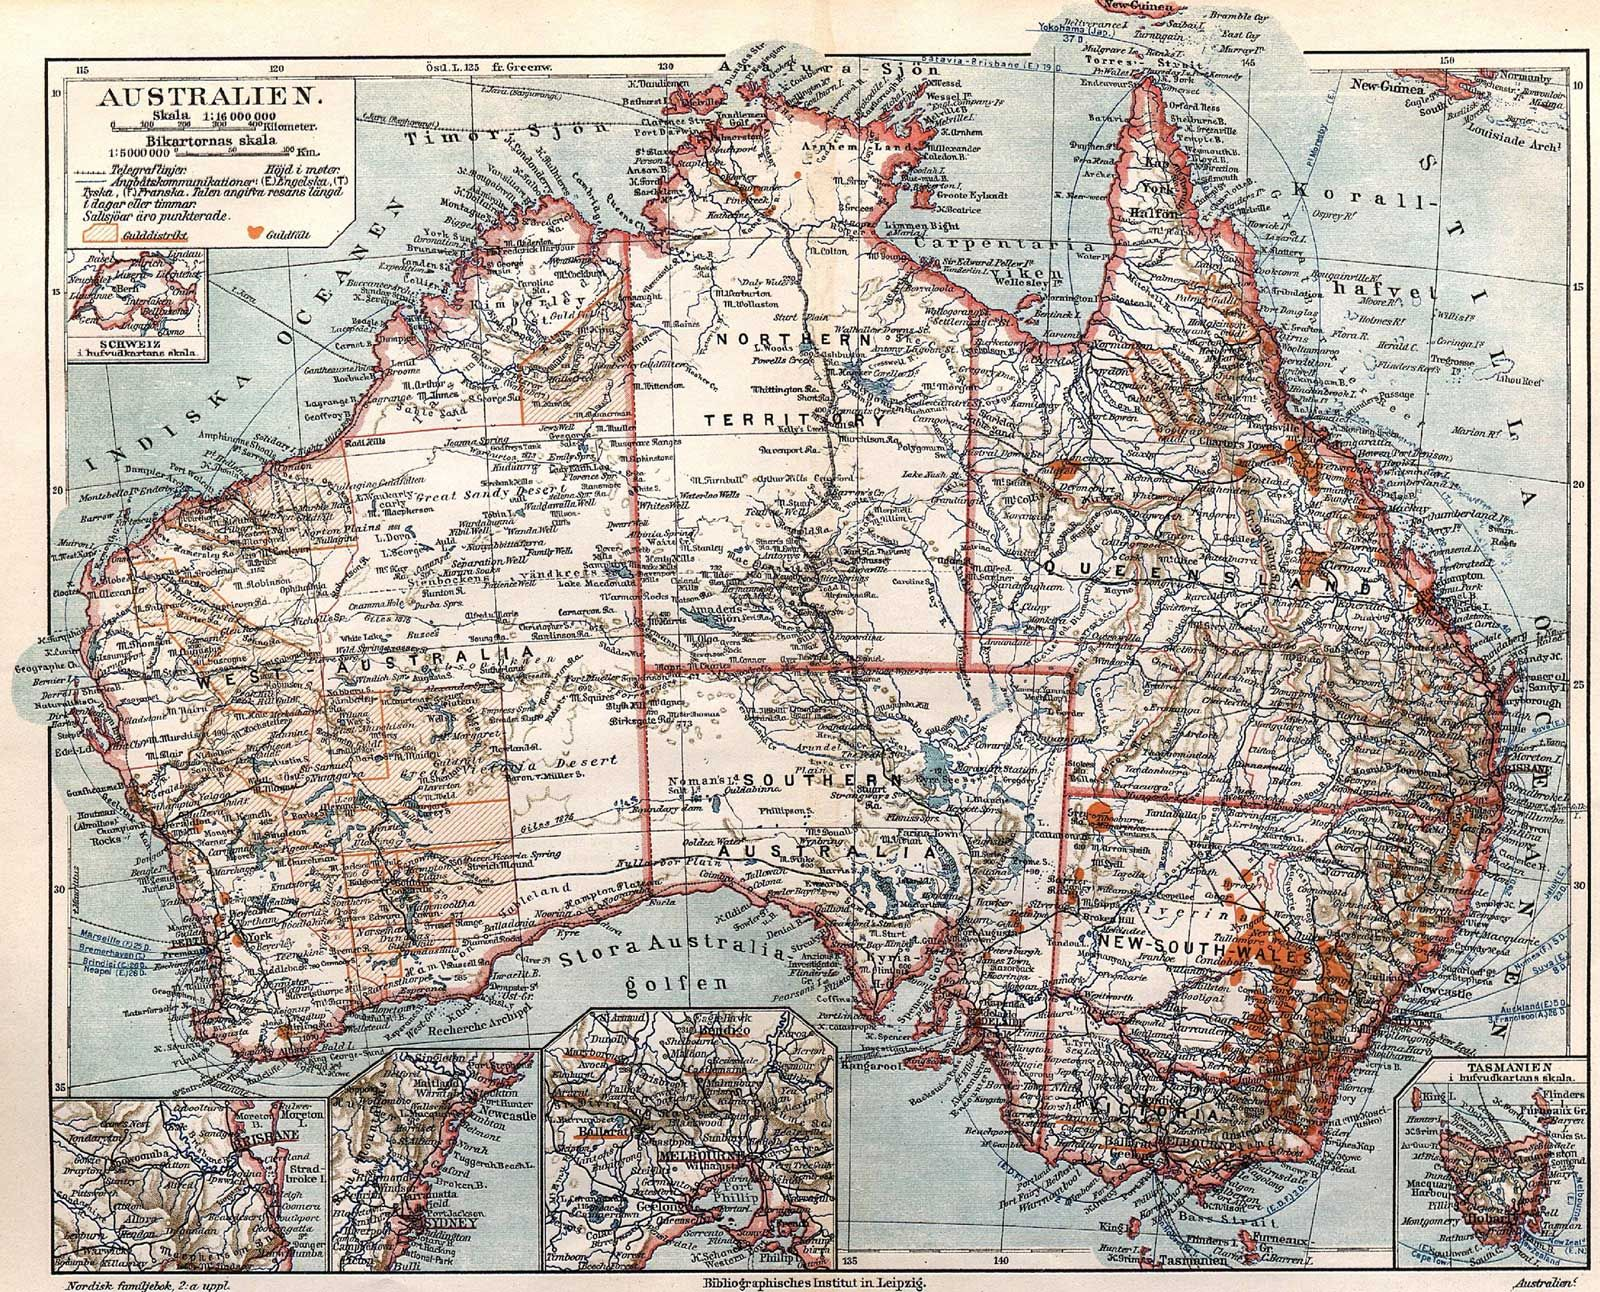 Australia Map Latitude.Australia Capital Canberra Longitude Latitude 35 15 S 149 08 E